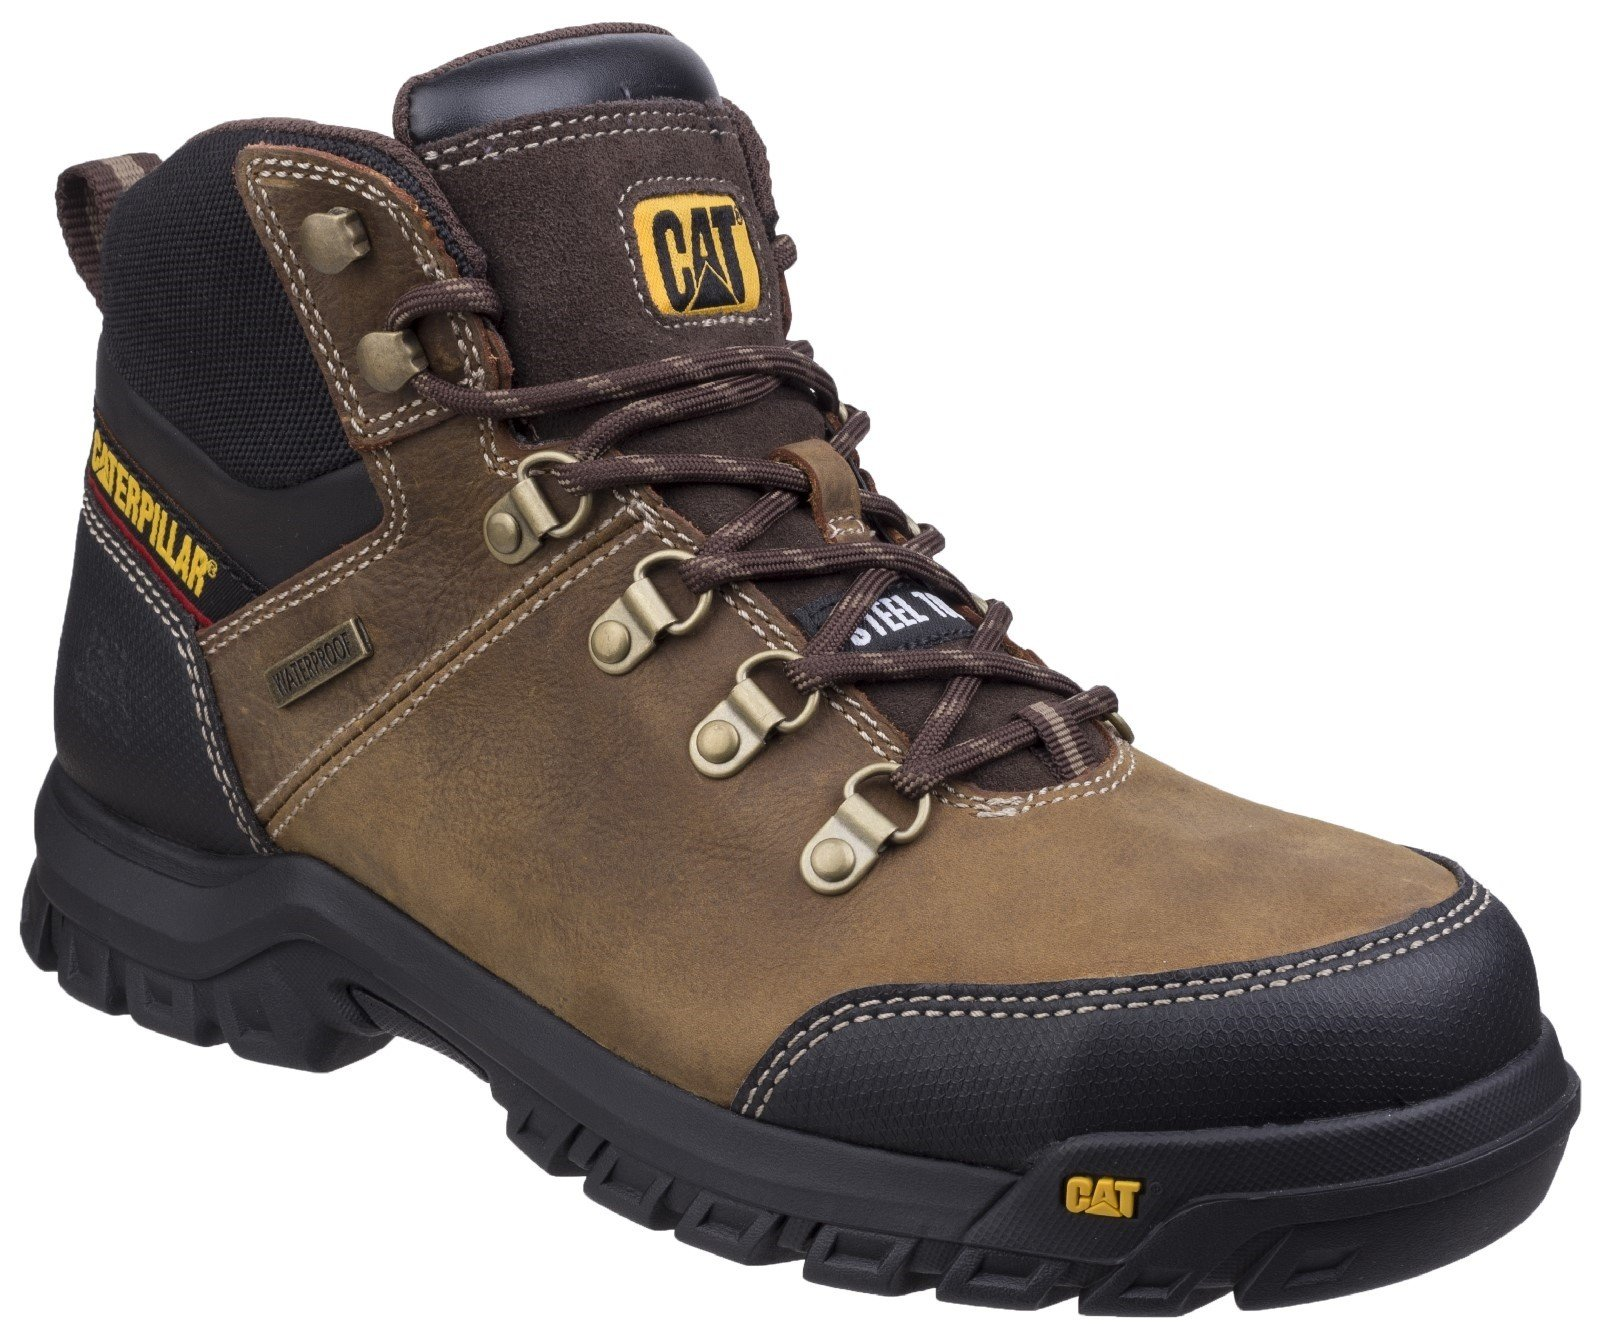 Caterpillar Men's Framework Boot Seal Brown 26947 - Seal Brown 6